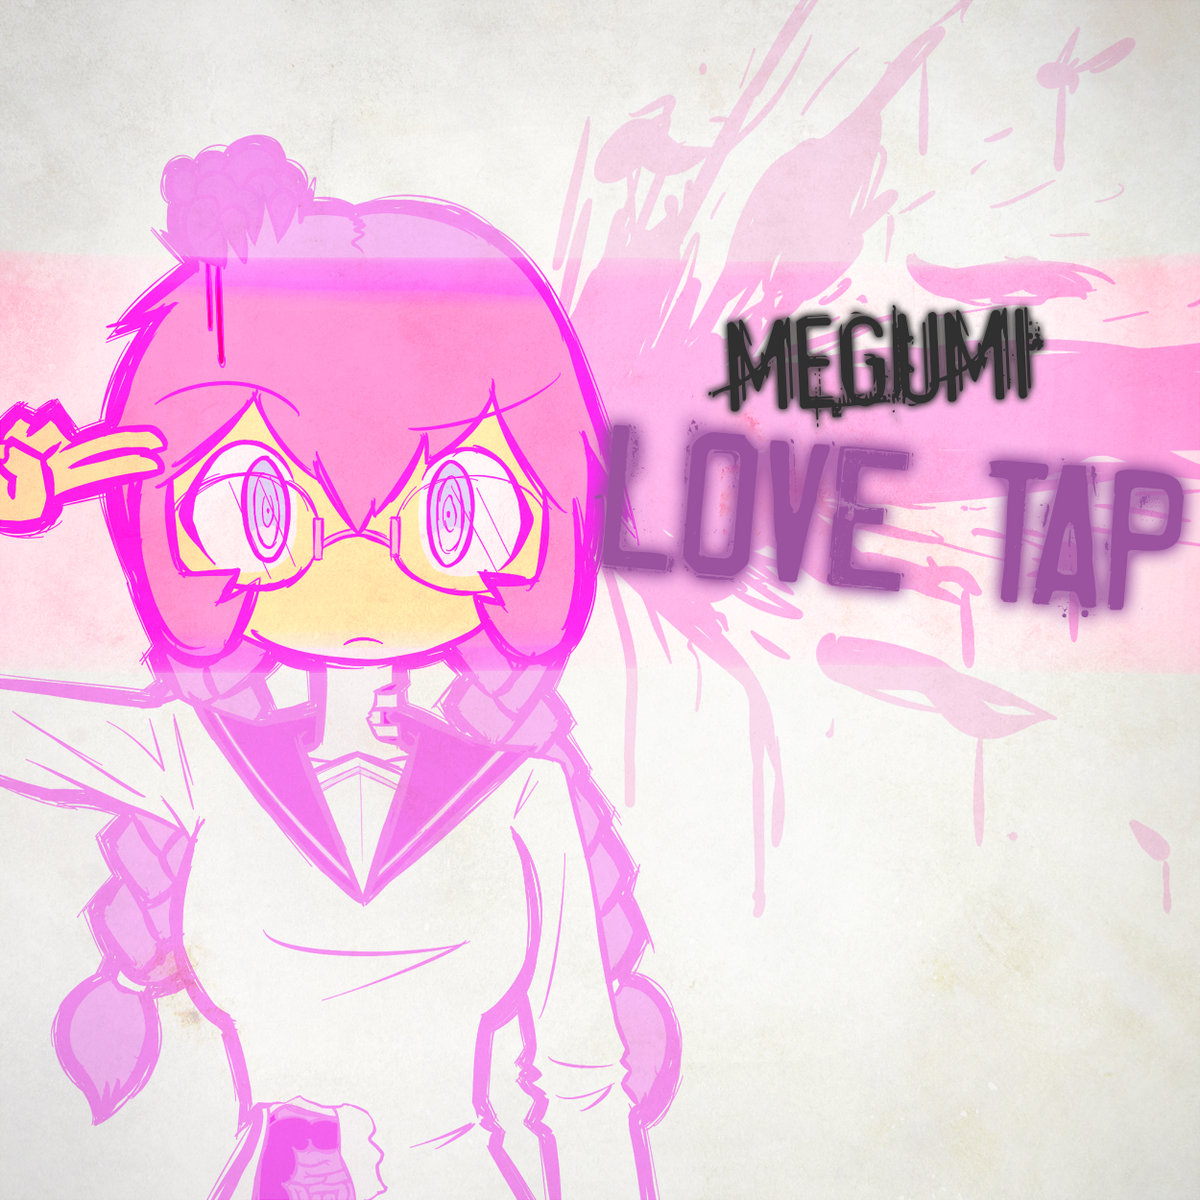 love tap seeing stars